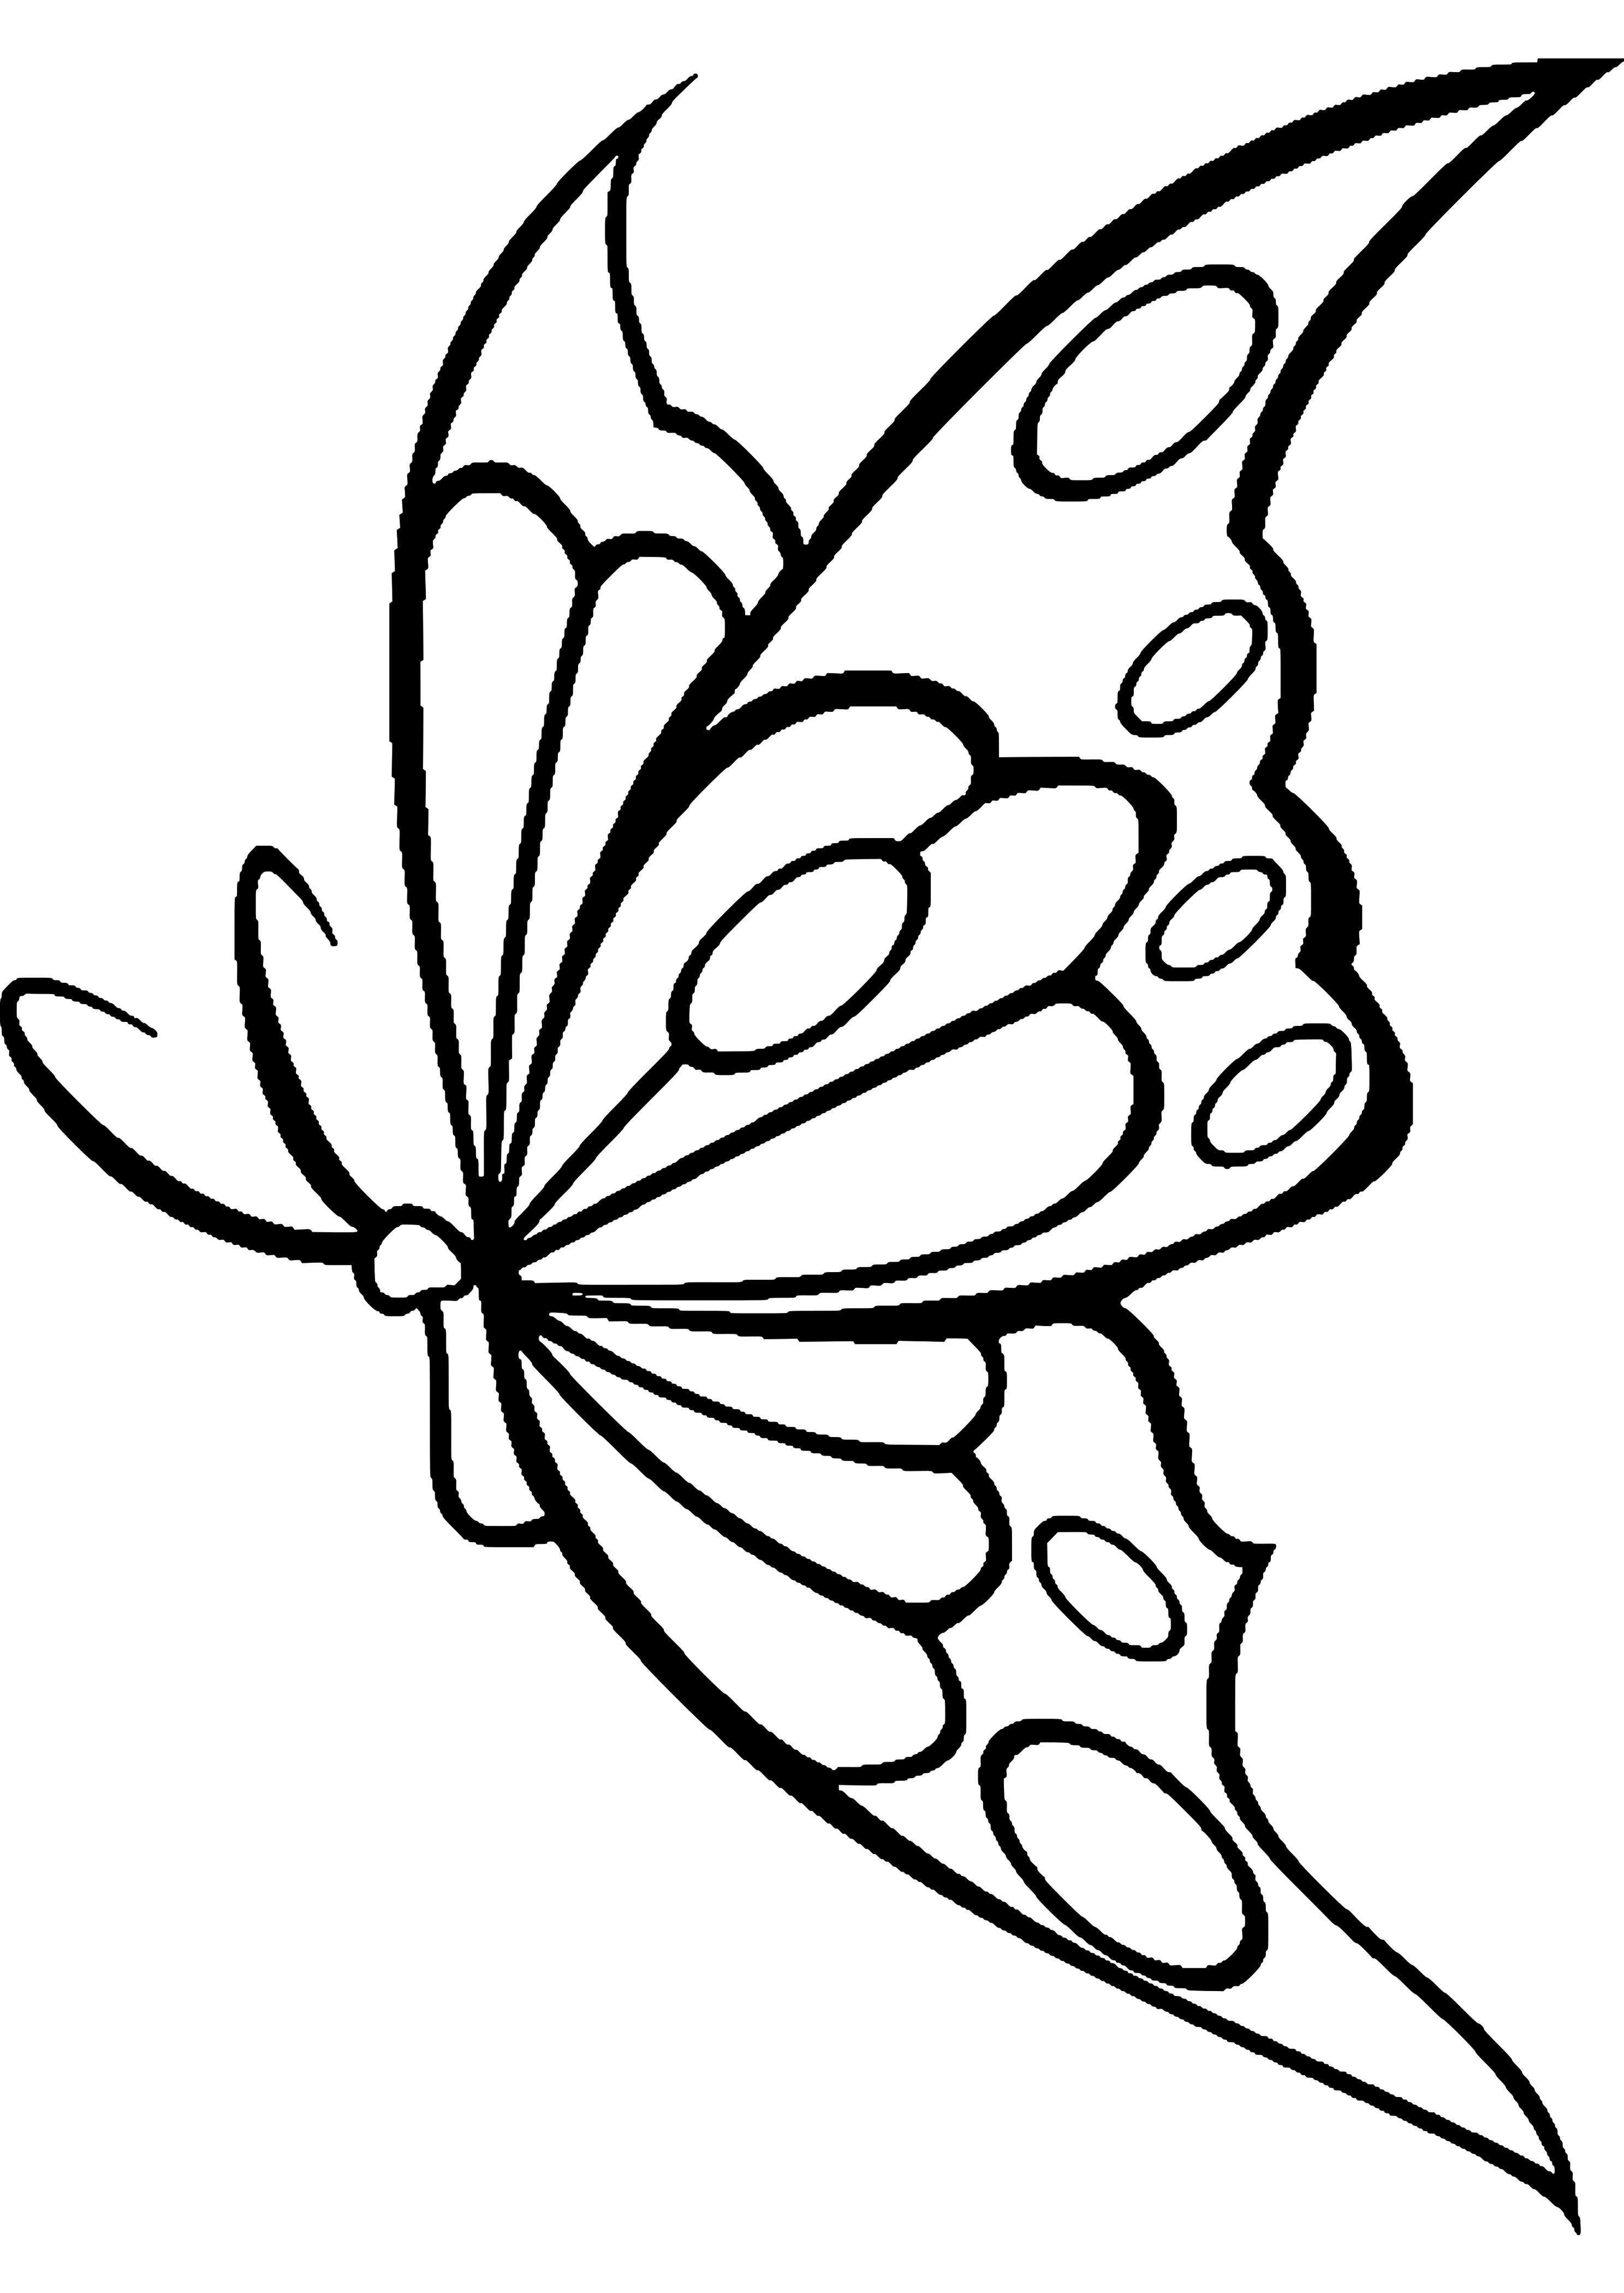 modele de papillon a imprimer galerie tatouage. Black Bedroom Furniture Sets. Home Design Ideas